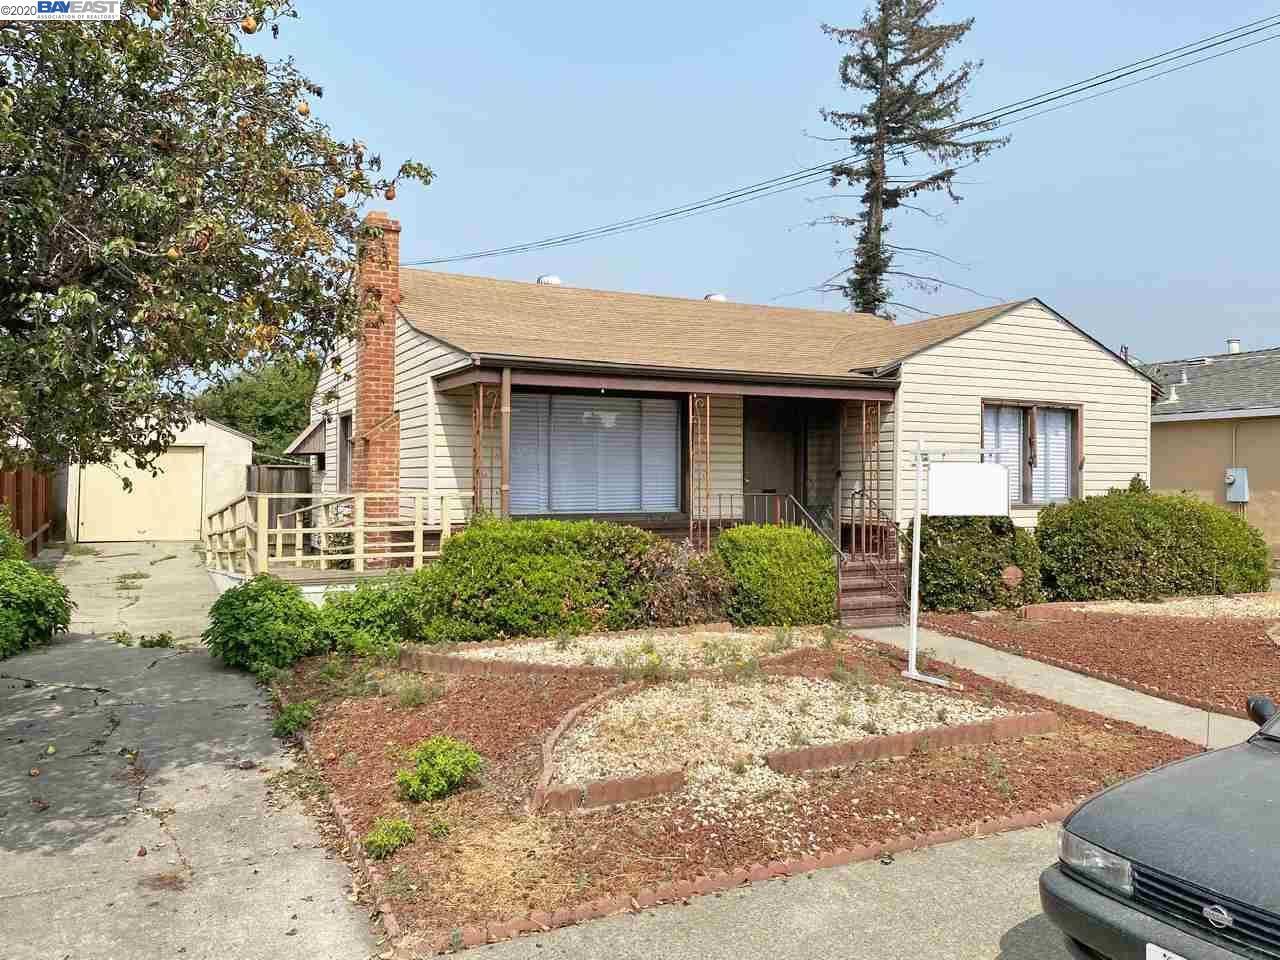 14964 Western Ave, San Leandro, CA 94578 - MLS#: 40920861